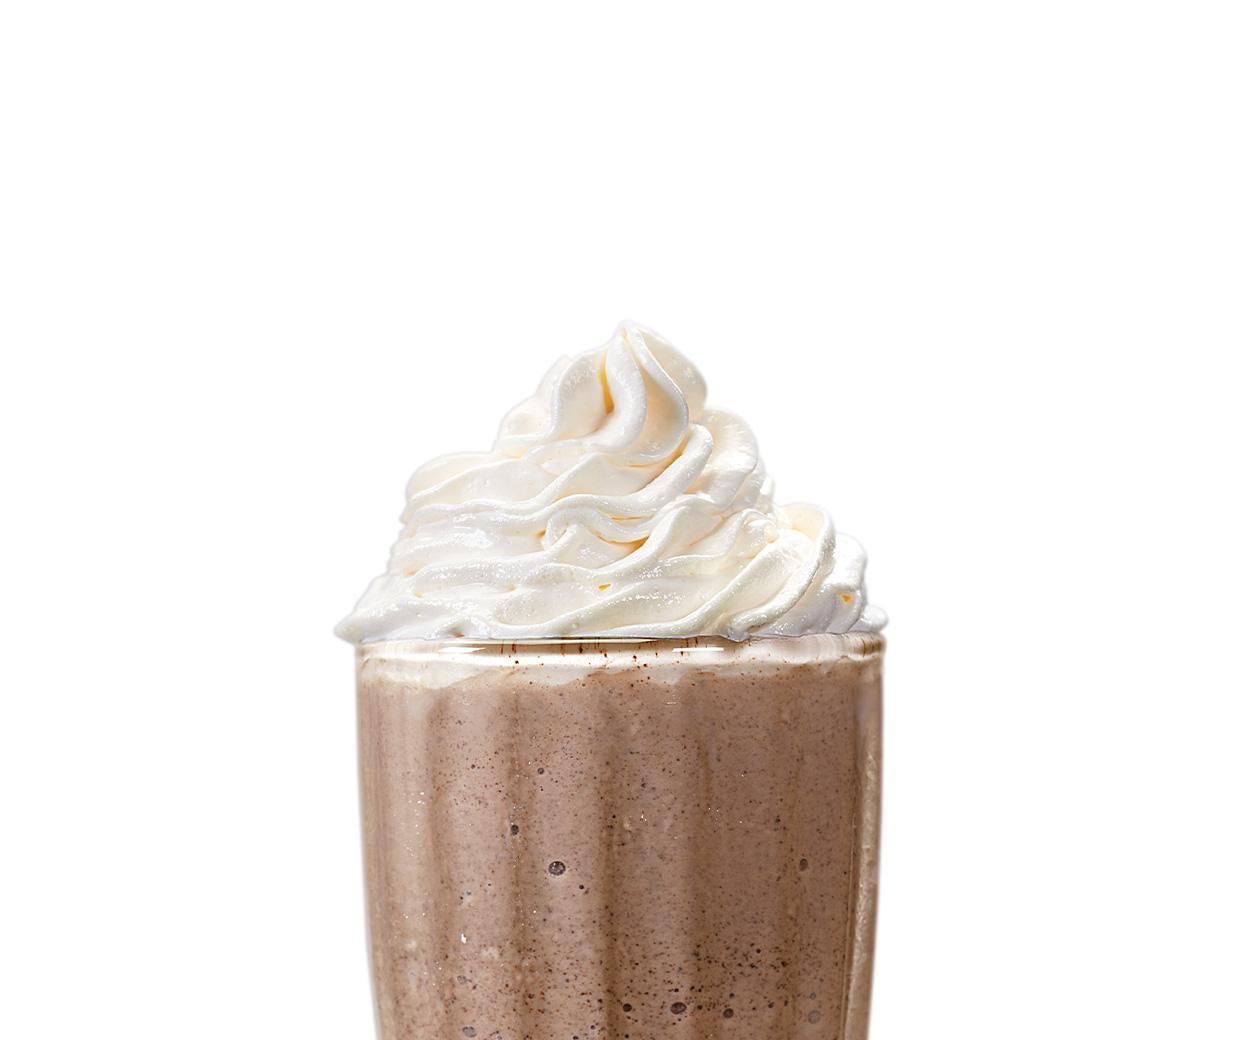 Ice Cream Cake n Shake at Cold Stone Creamery